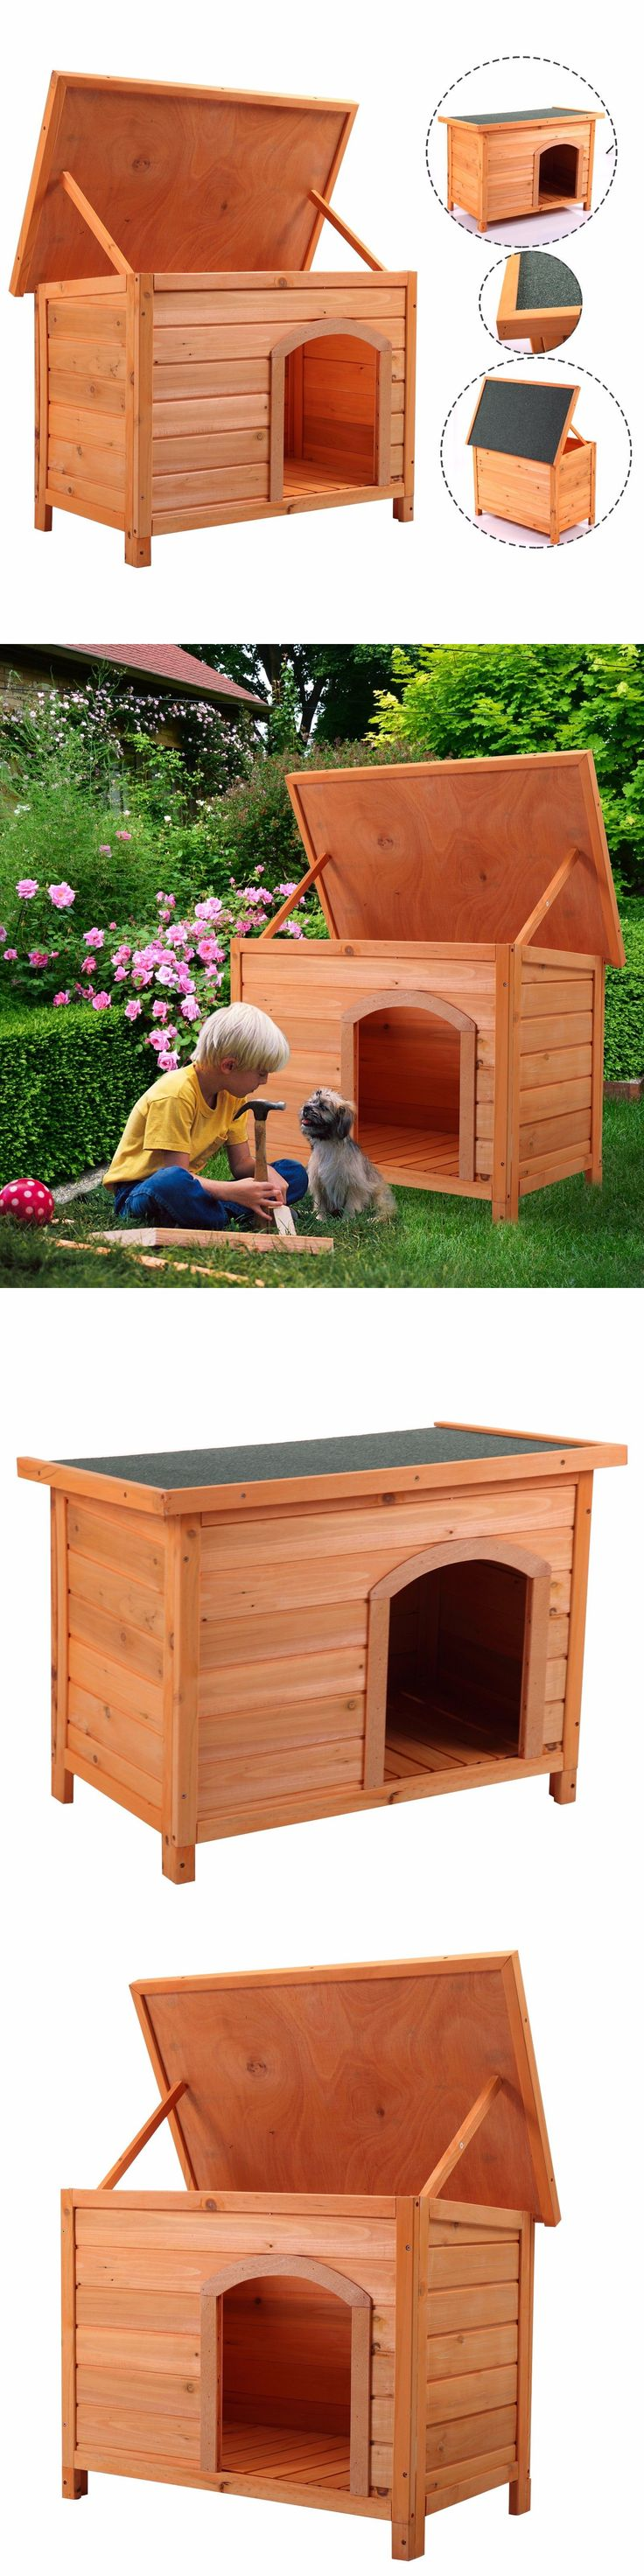 1180 best Diy Pet House Outdoor images on Pinterest Diy dog Pet